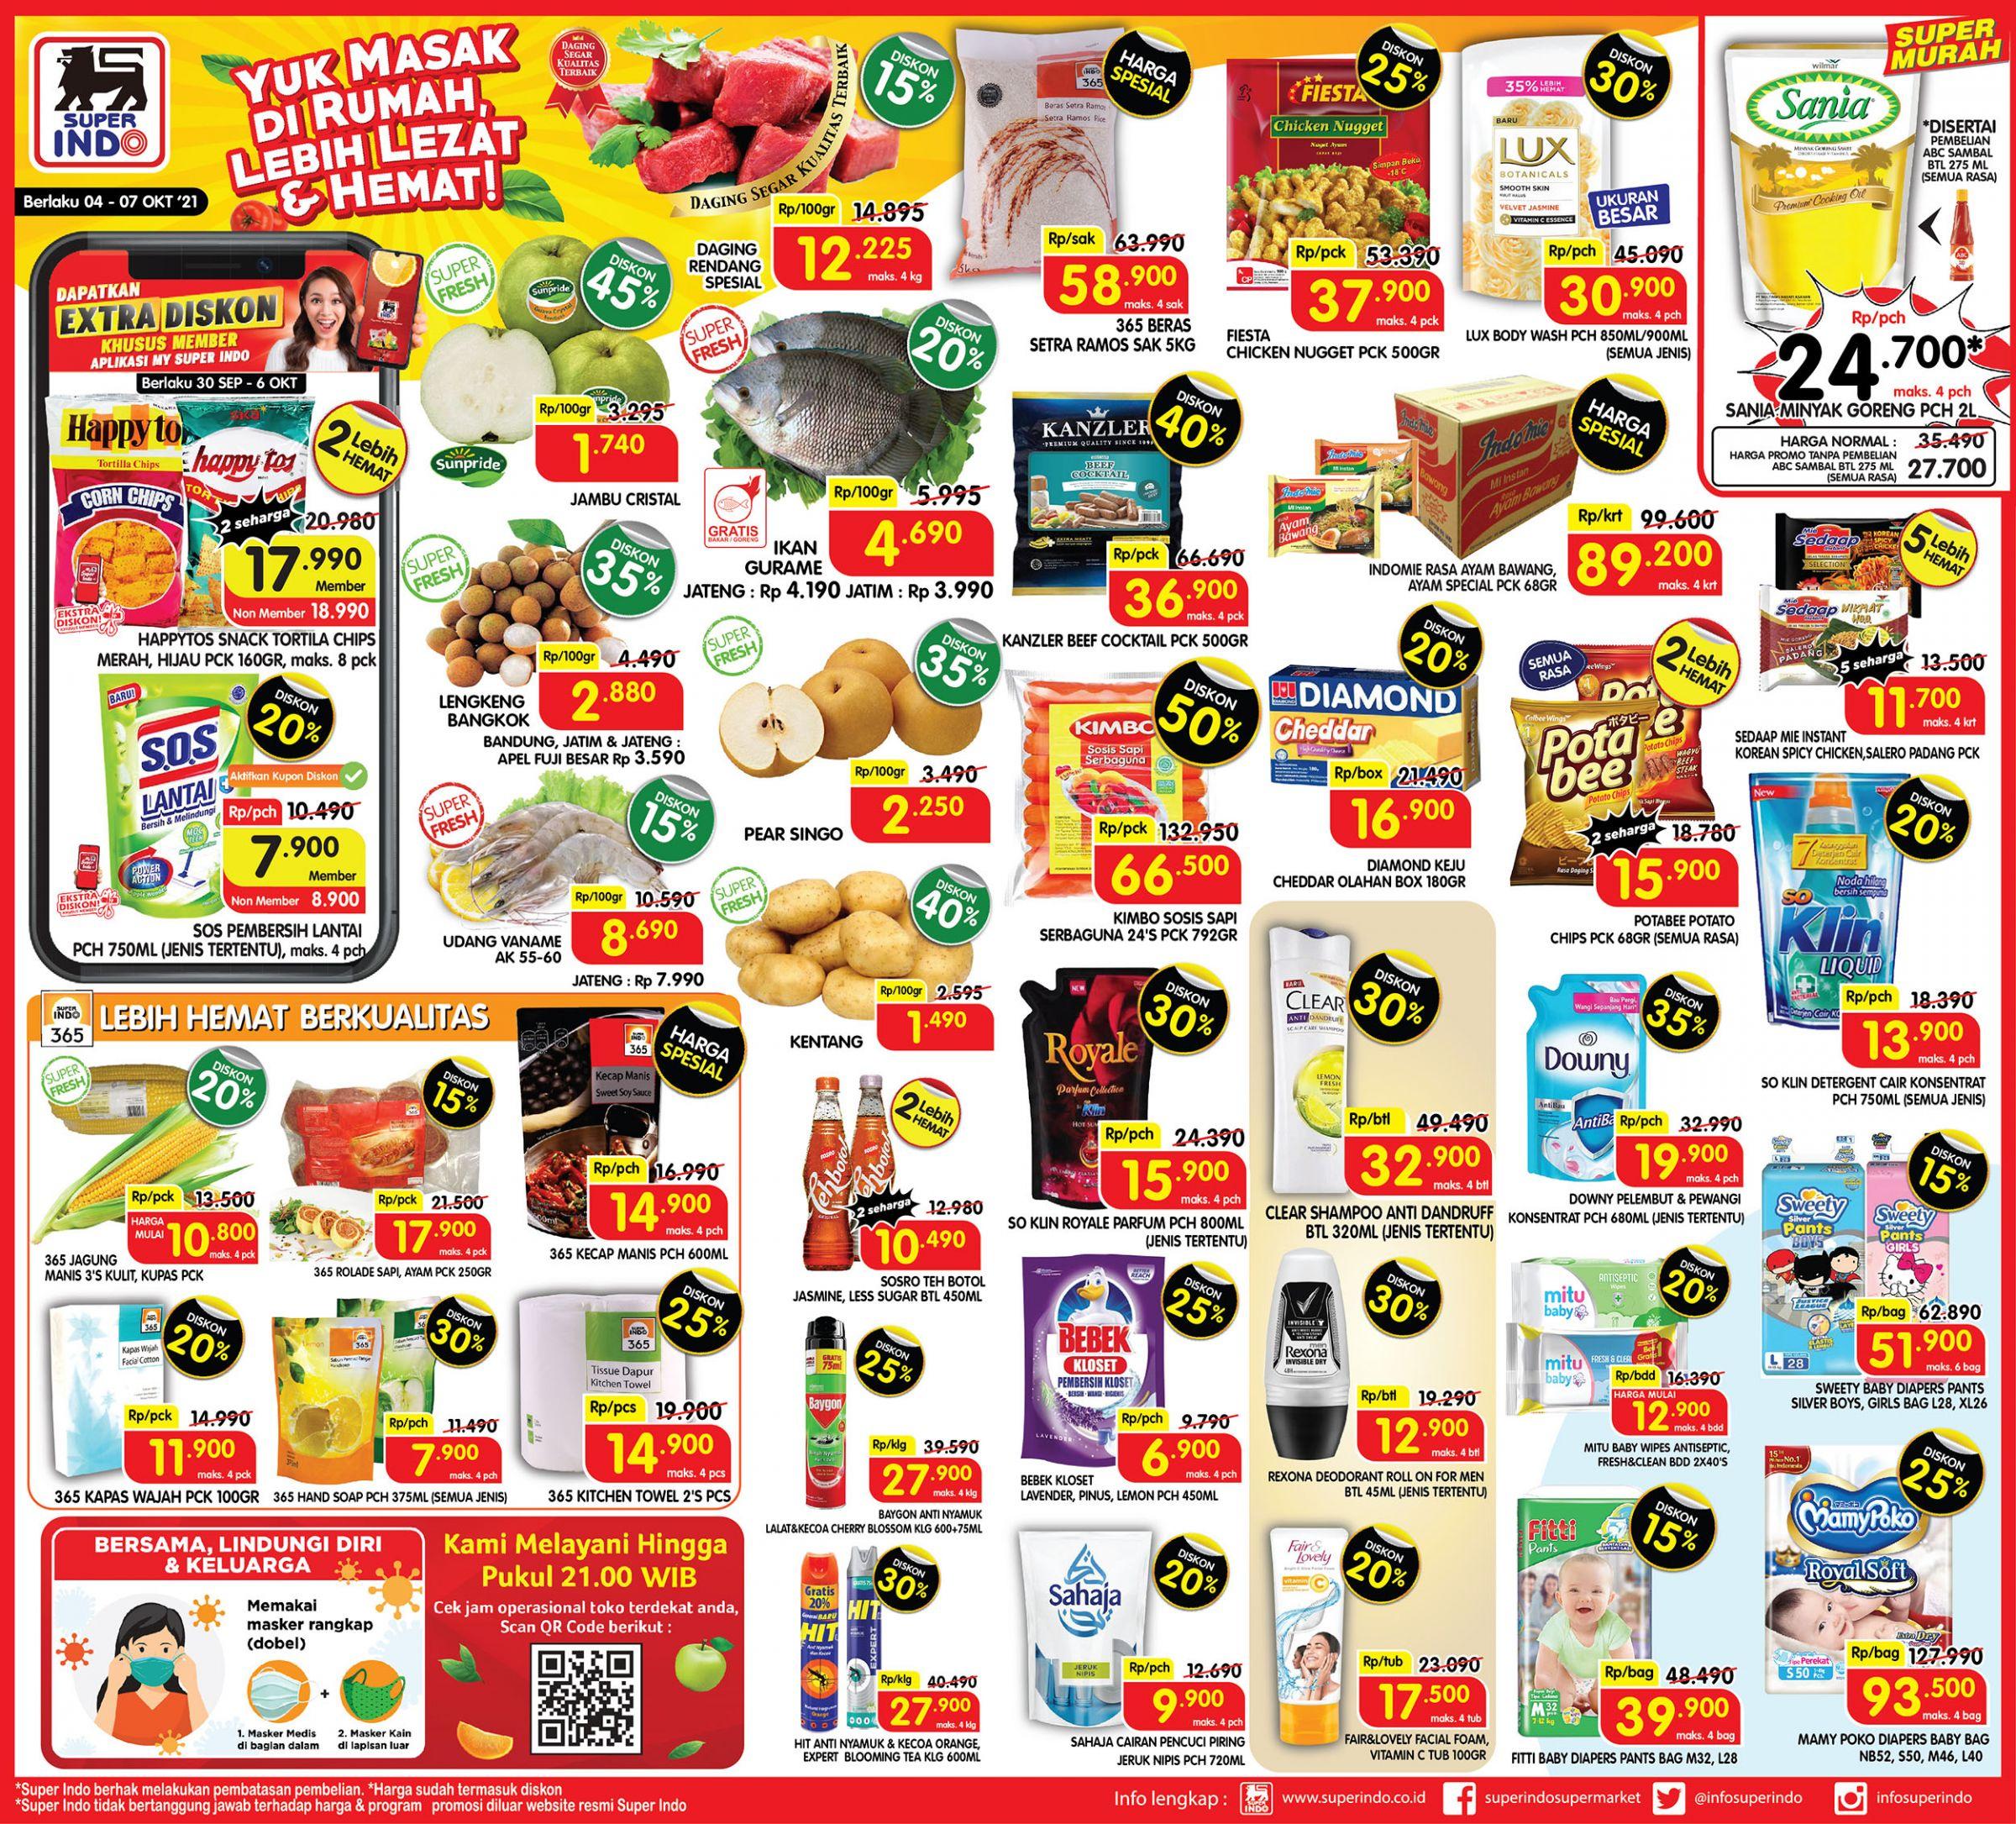 Promo Superindo Katalog Awal Pekan (Weekday) periode 04-07 Oktober 2021